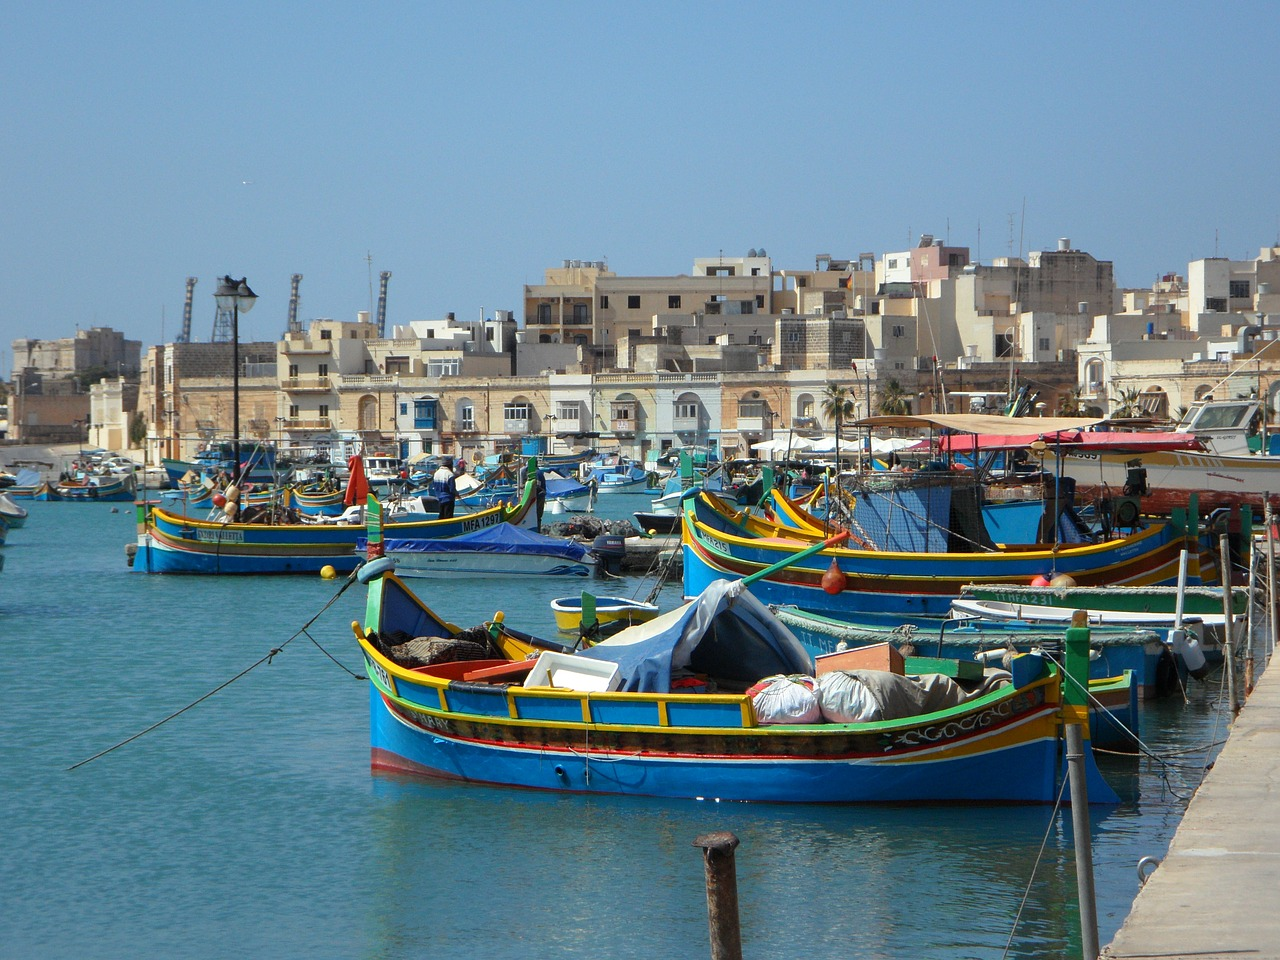 Malta Gaming Authority Publishes Amendments to its Sandbox Regulatory Framework